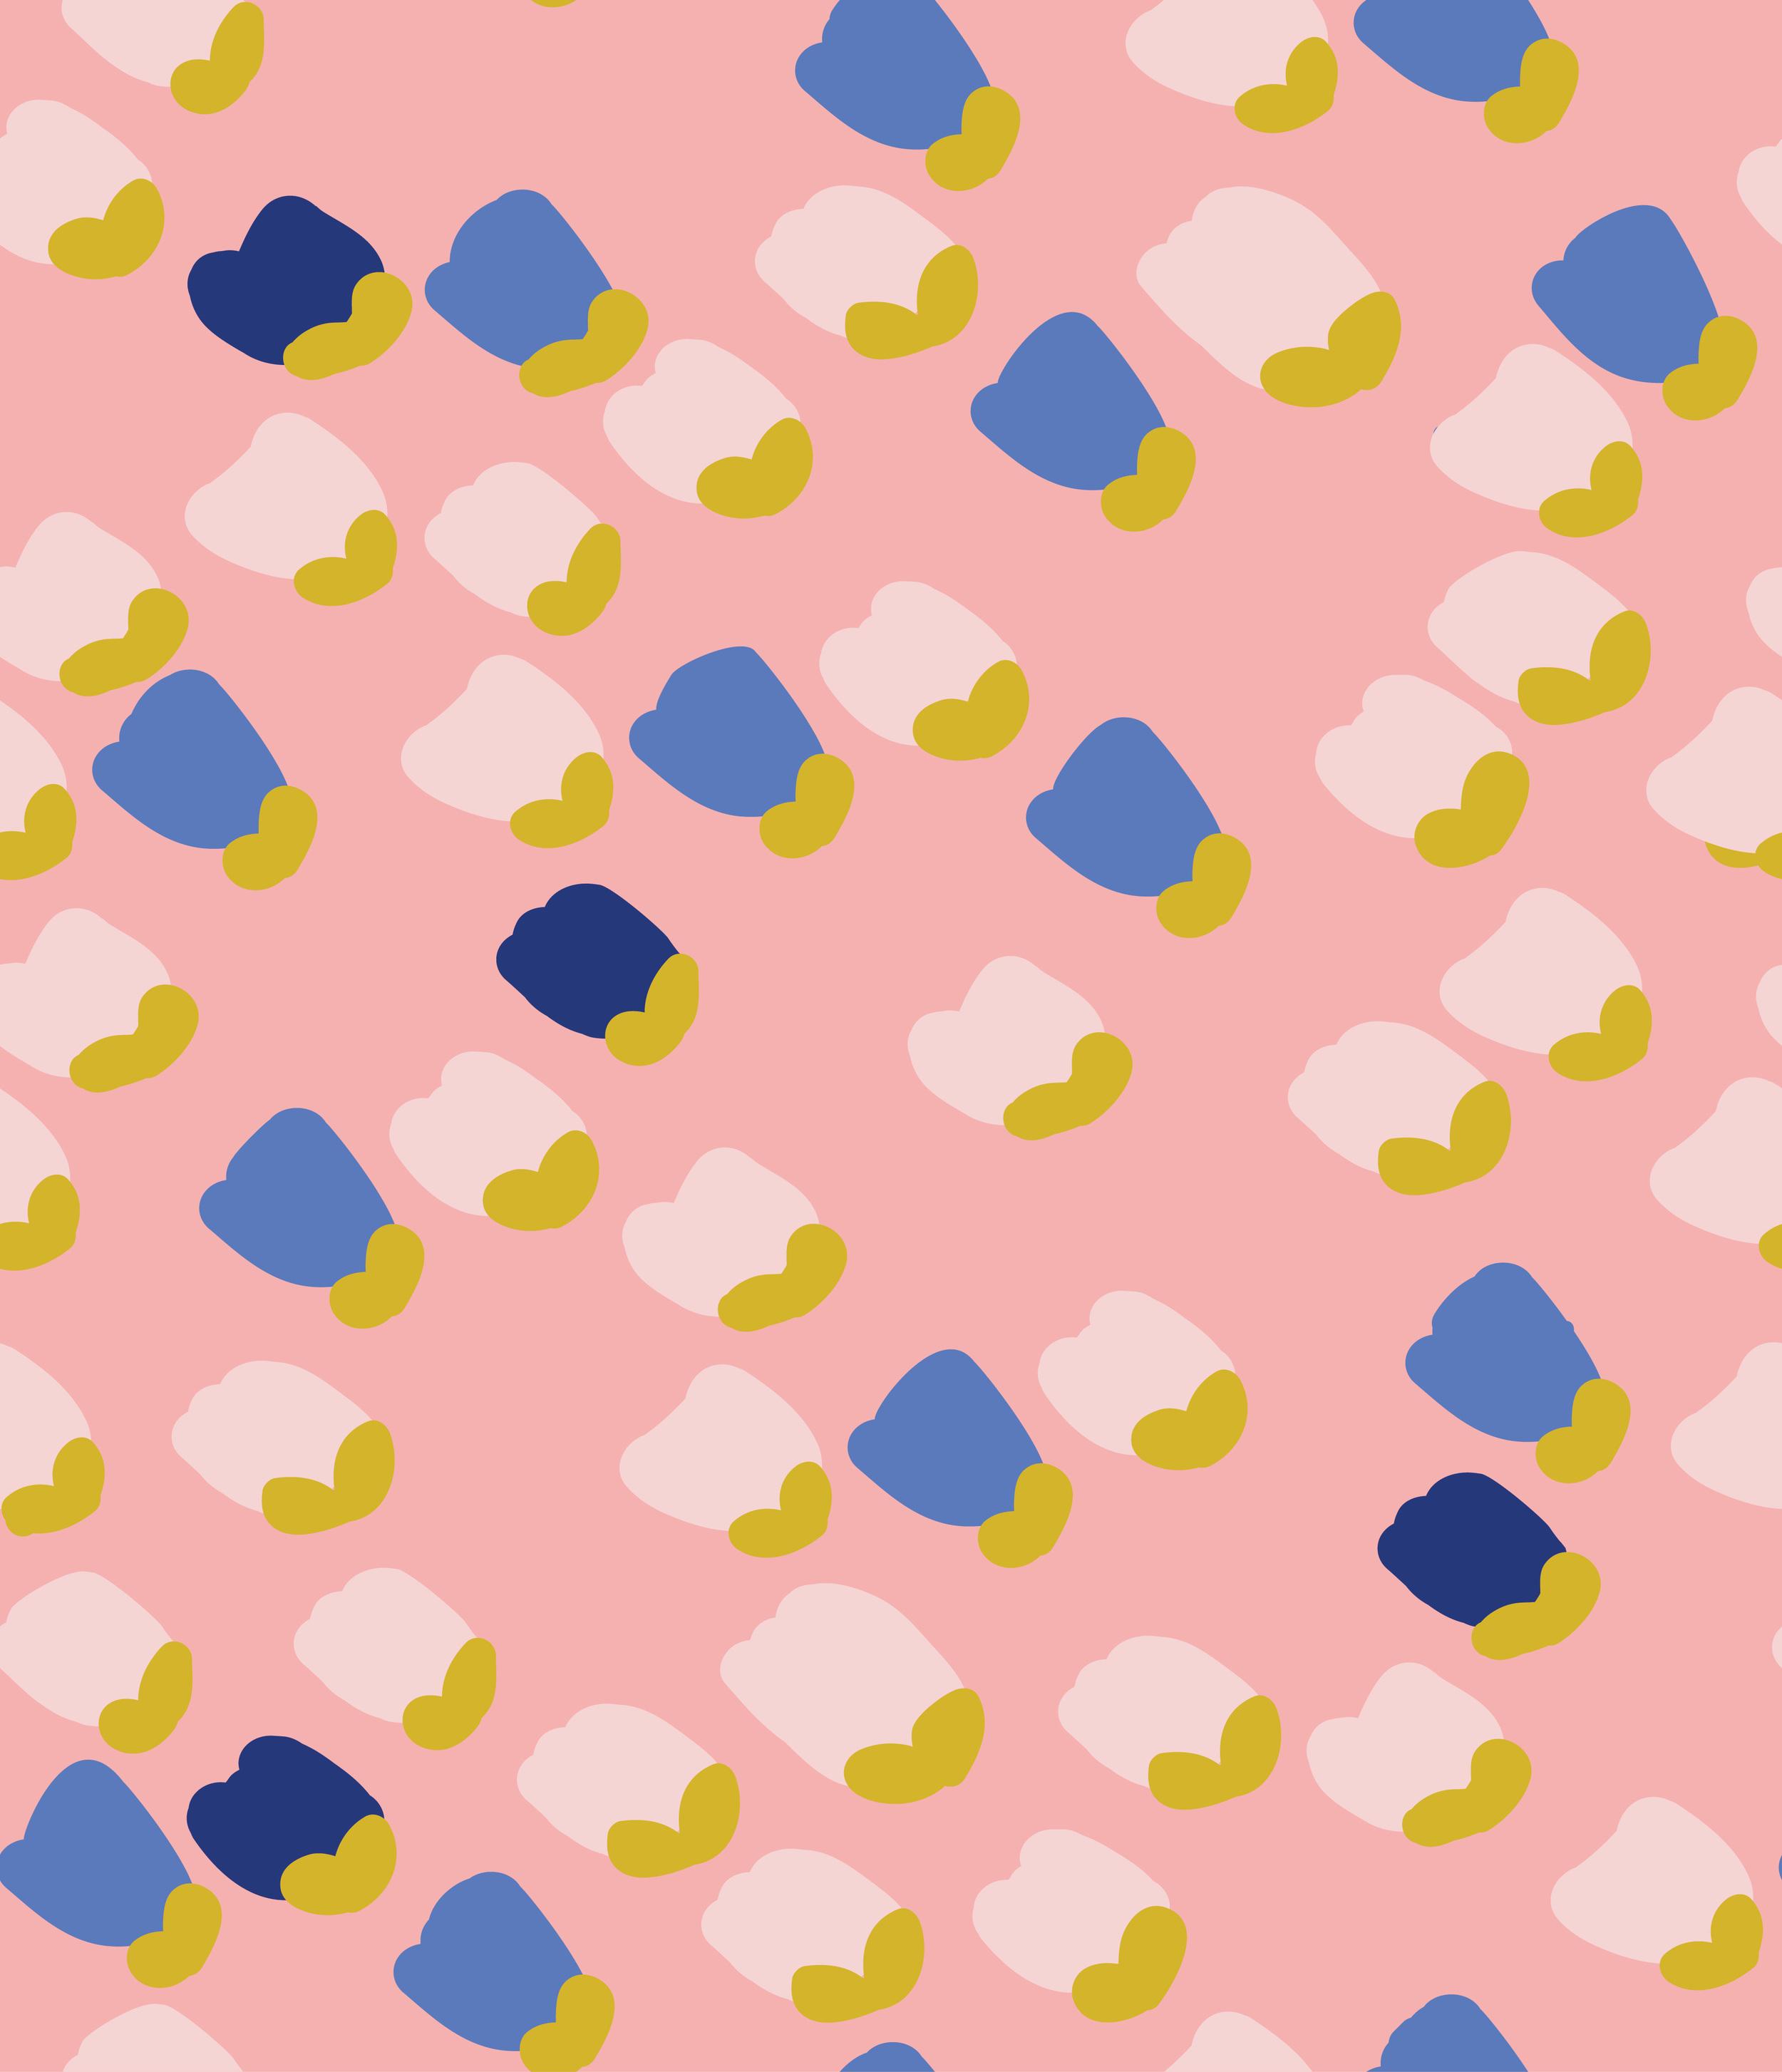 pinkbuds-01.jpg